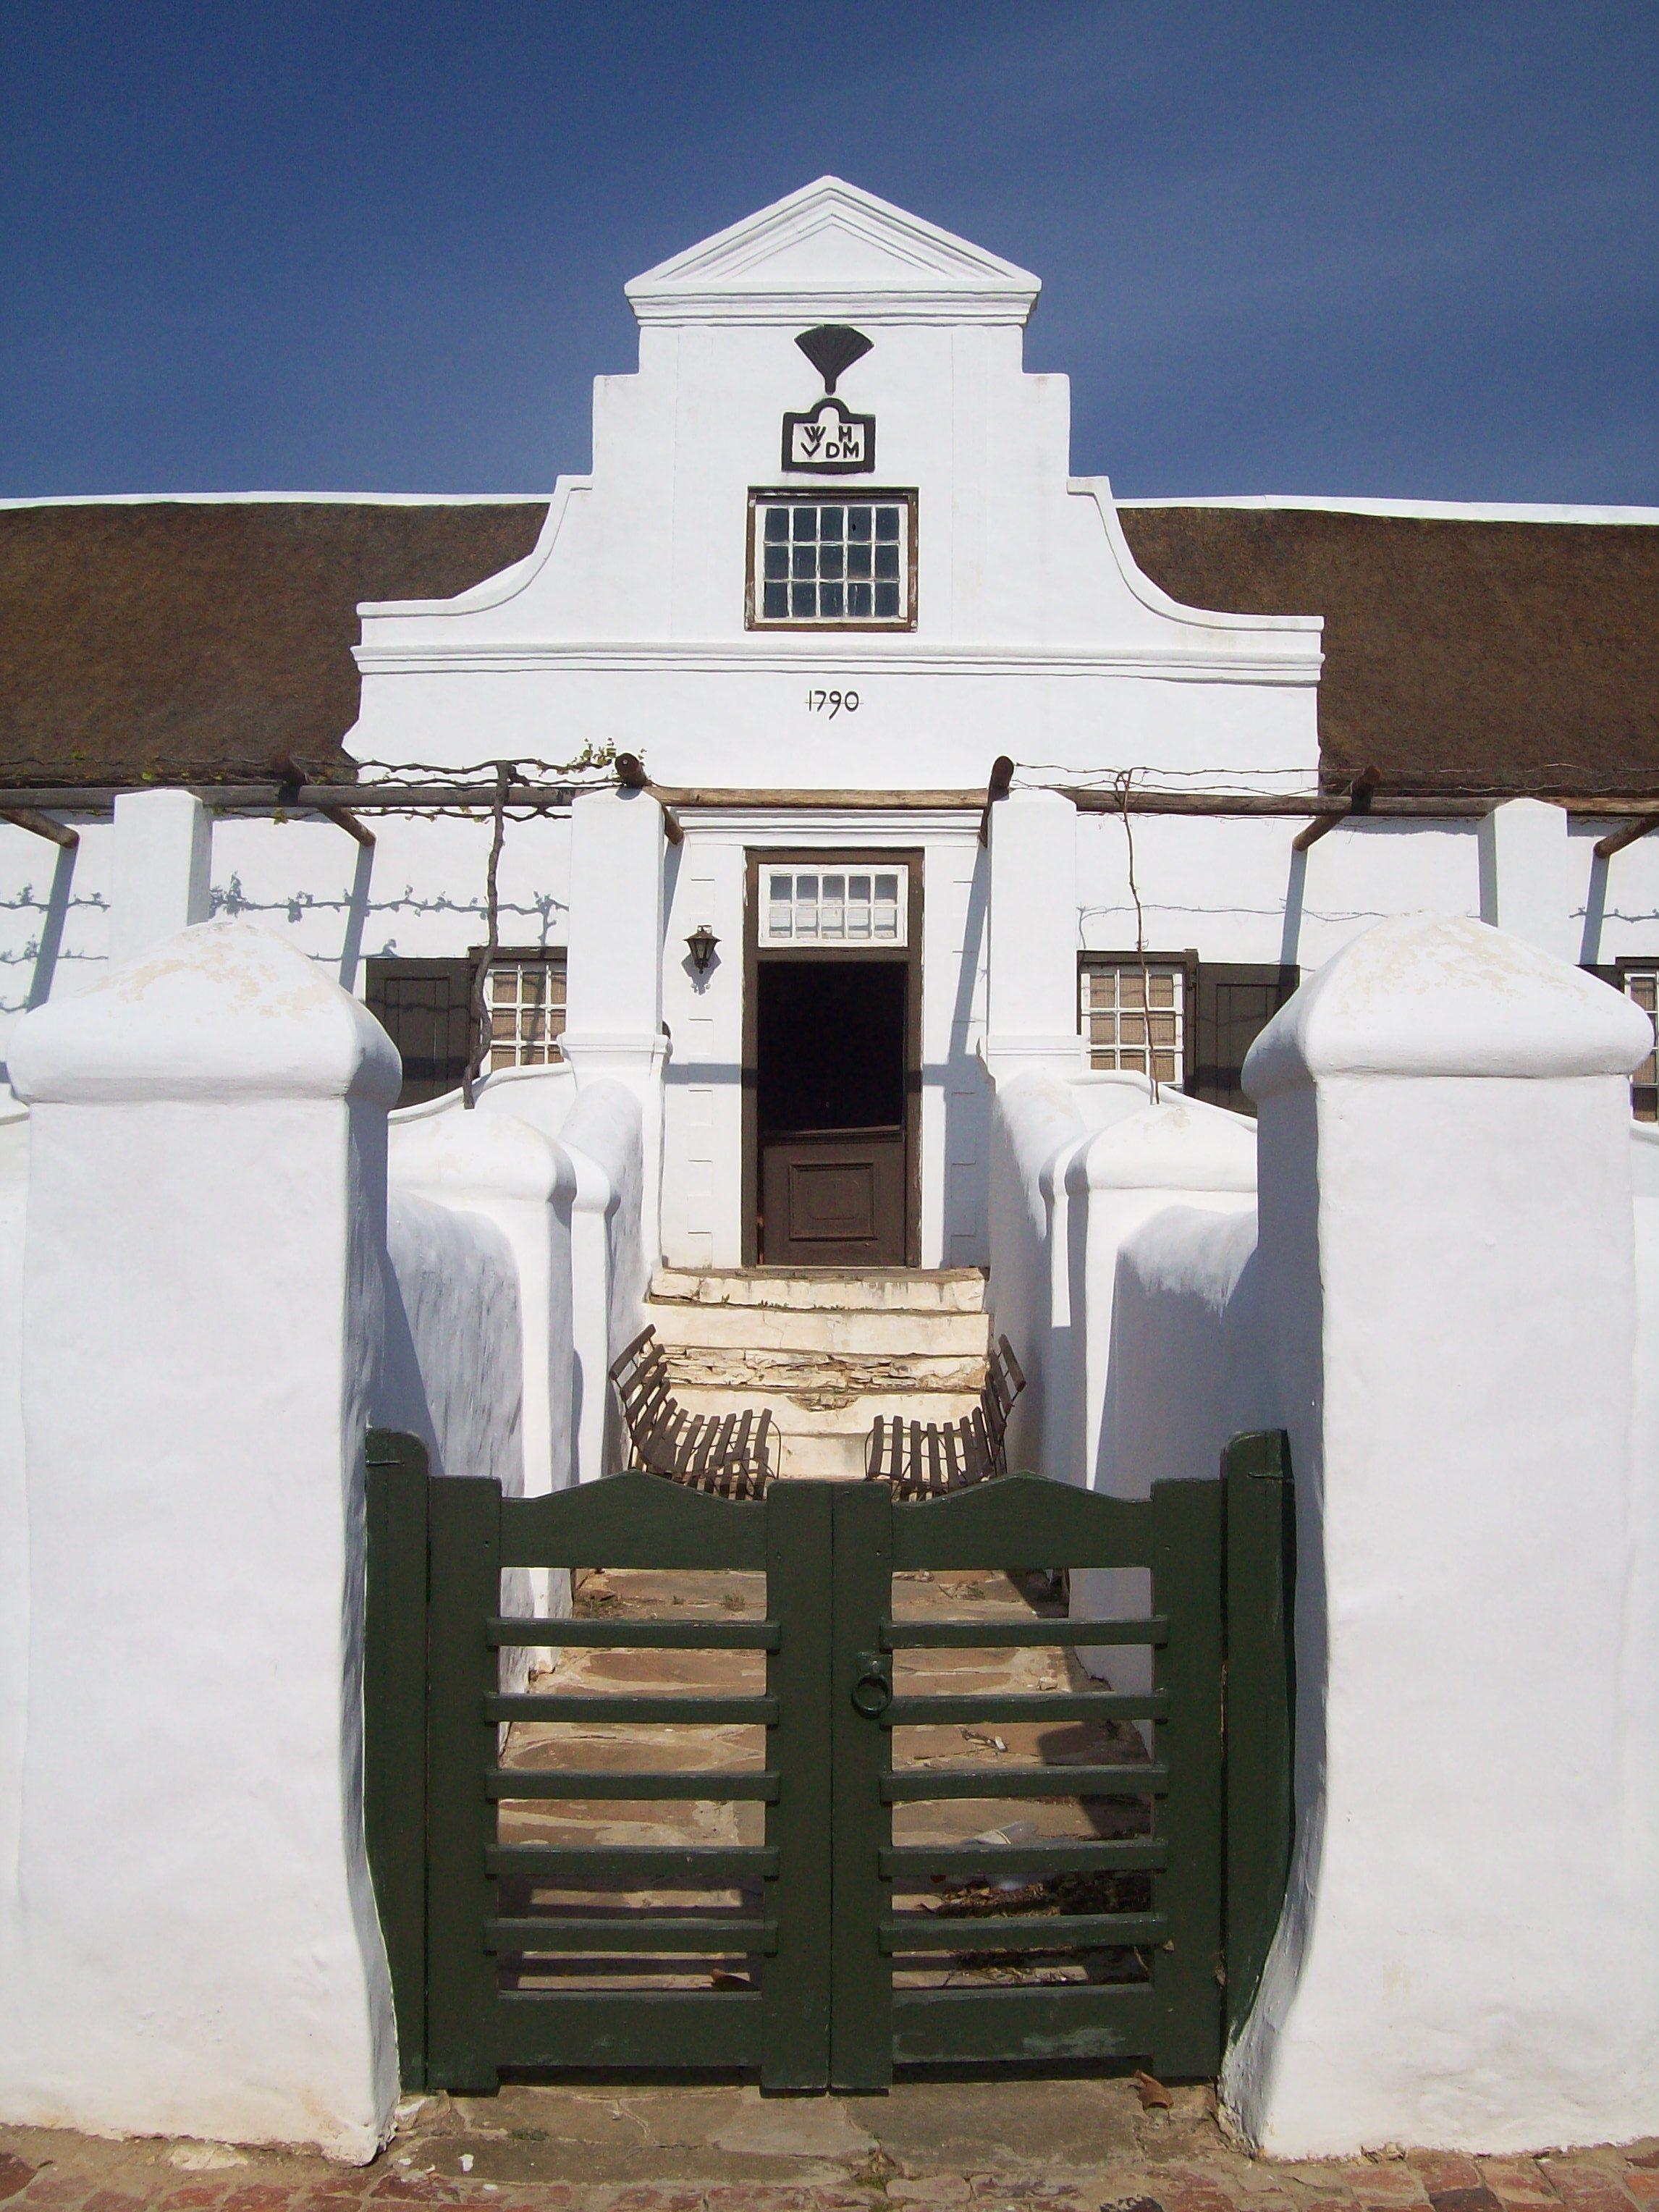 Doornrivier near worcester south africa built in 1790 by van der merwe photo by lynell ann roux